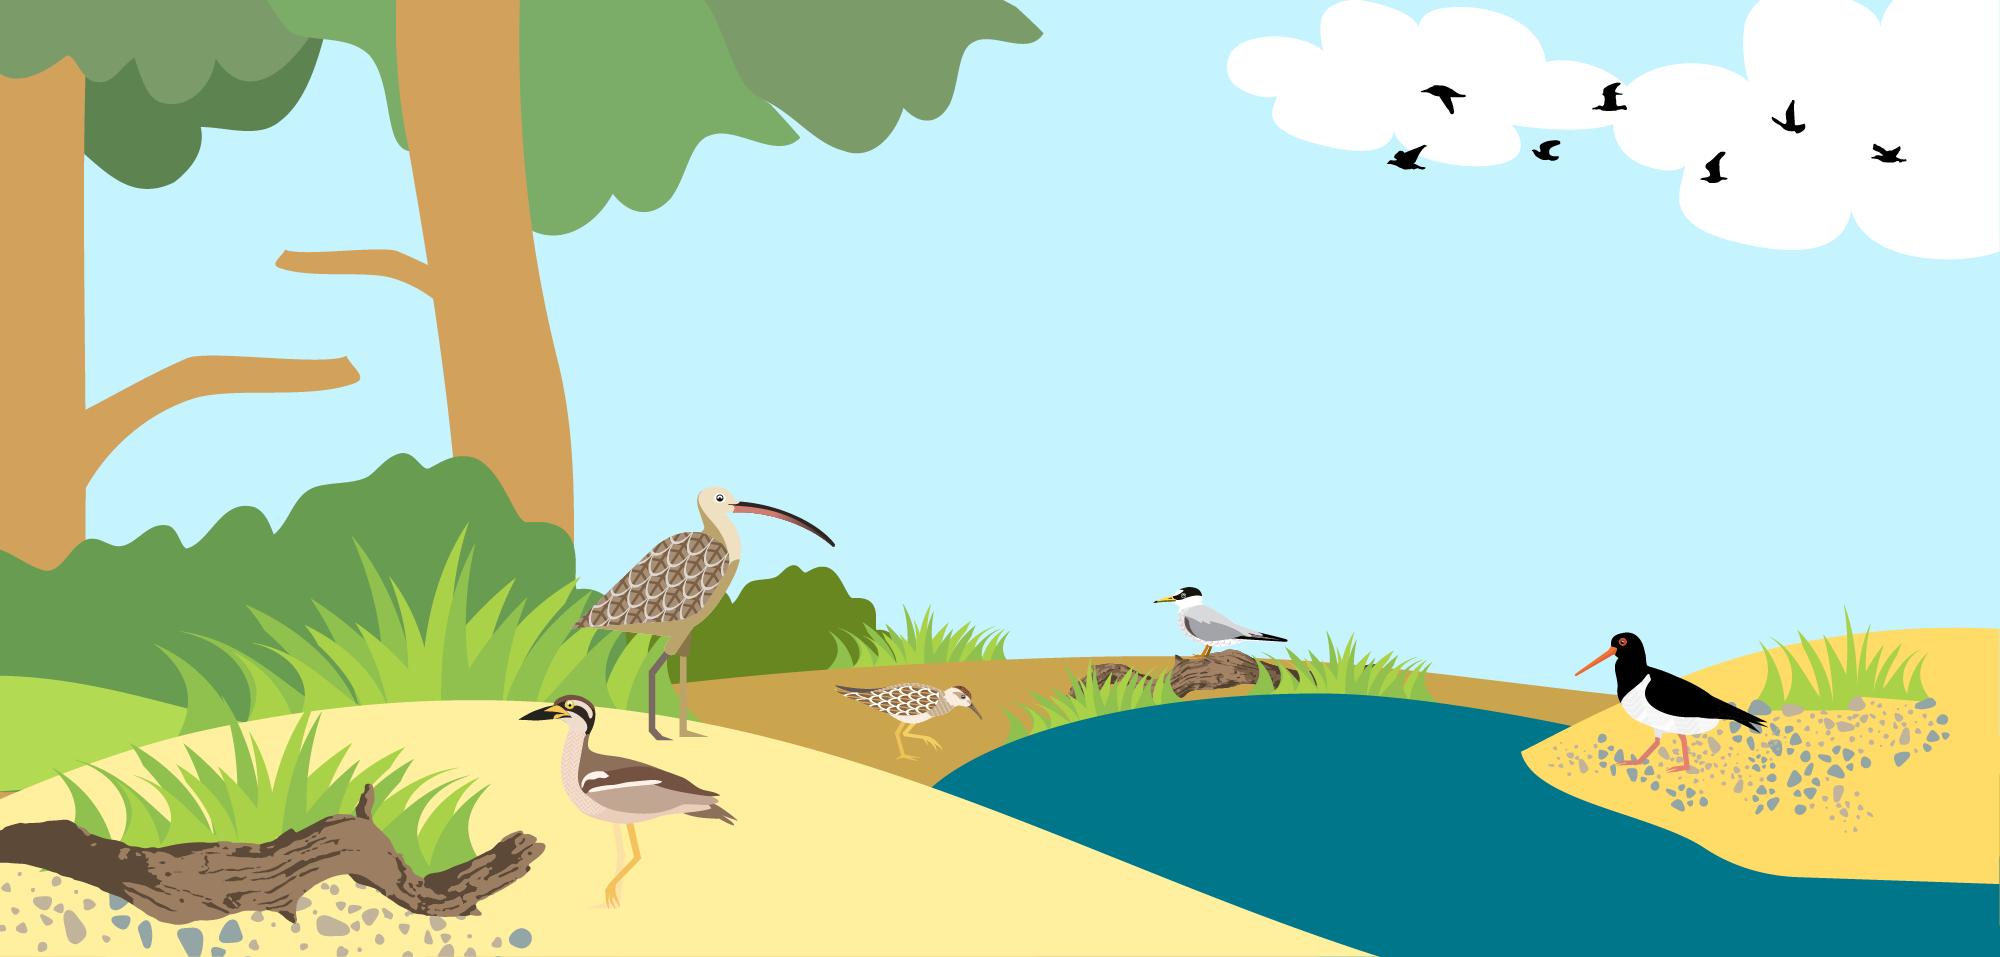 Shorebird Struggle